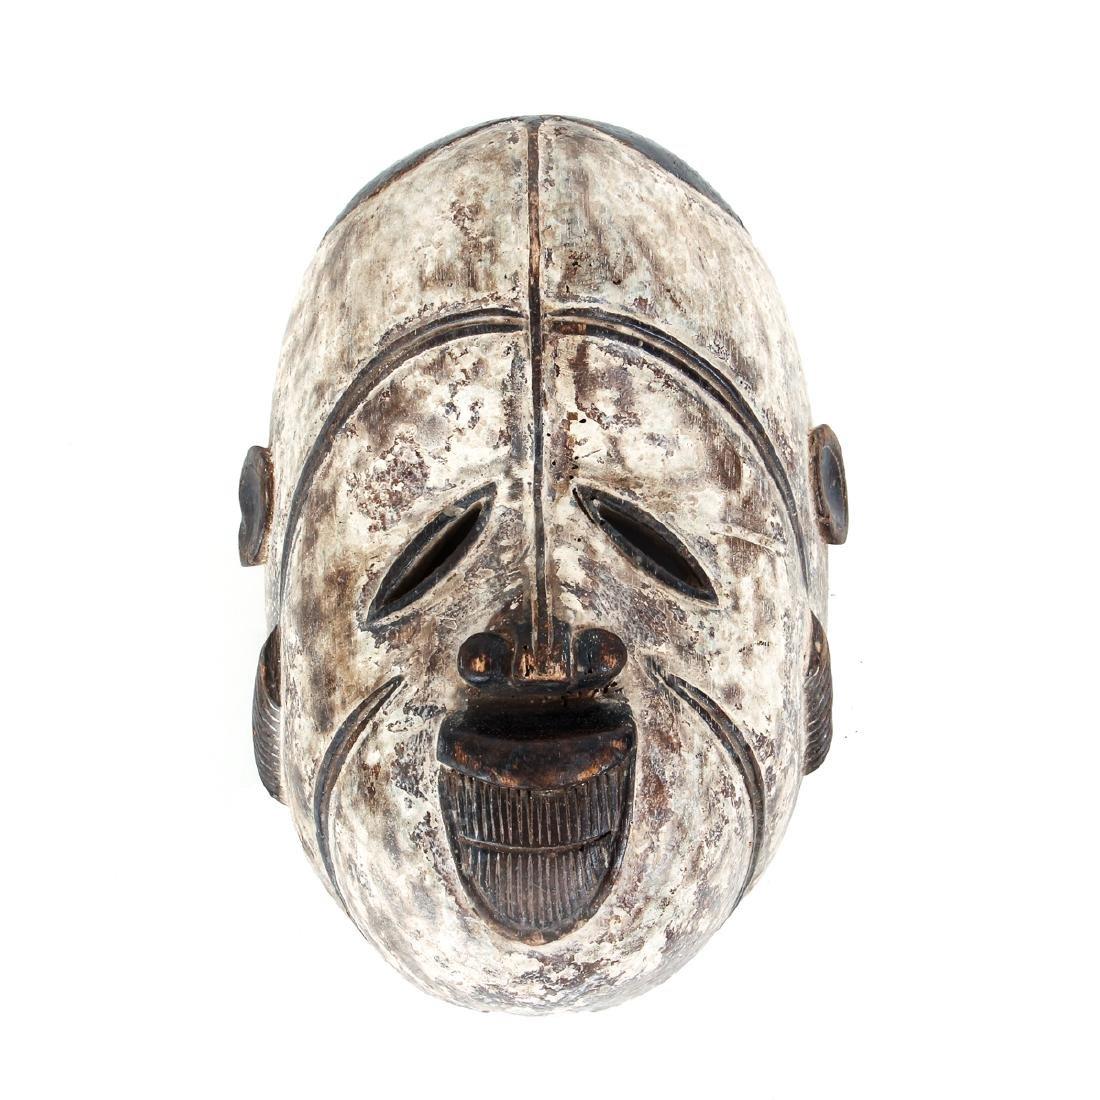 Southern Idoma or Igbo Peoples Mask